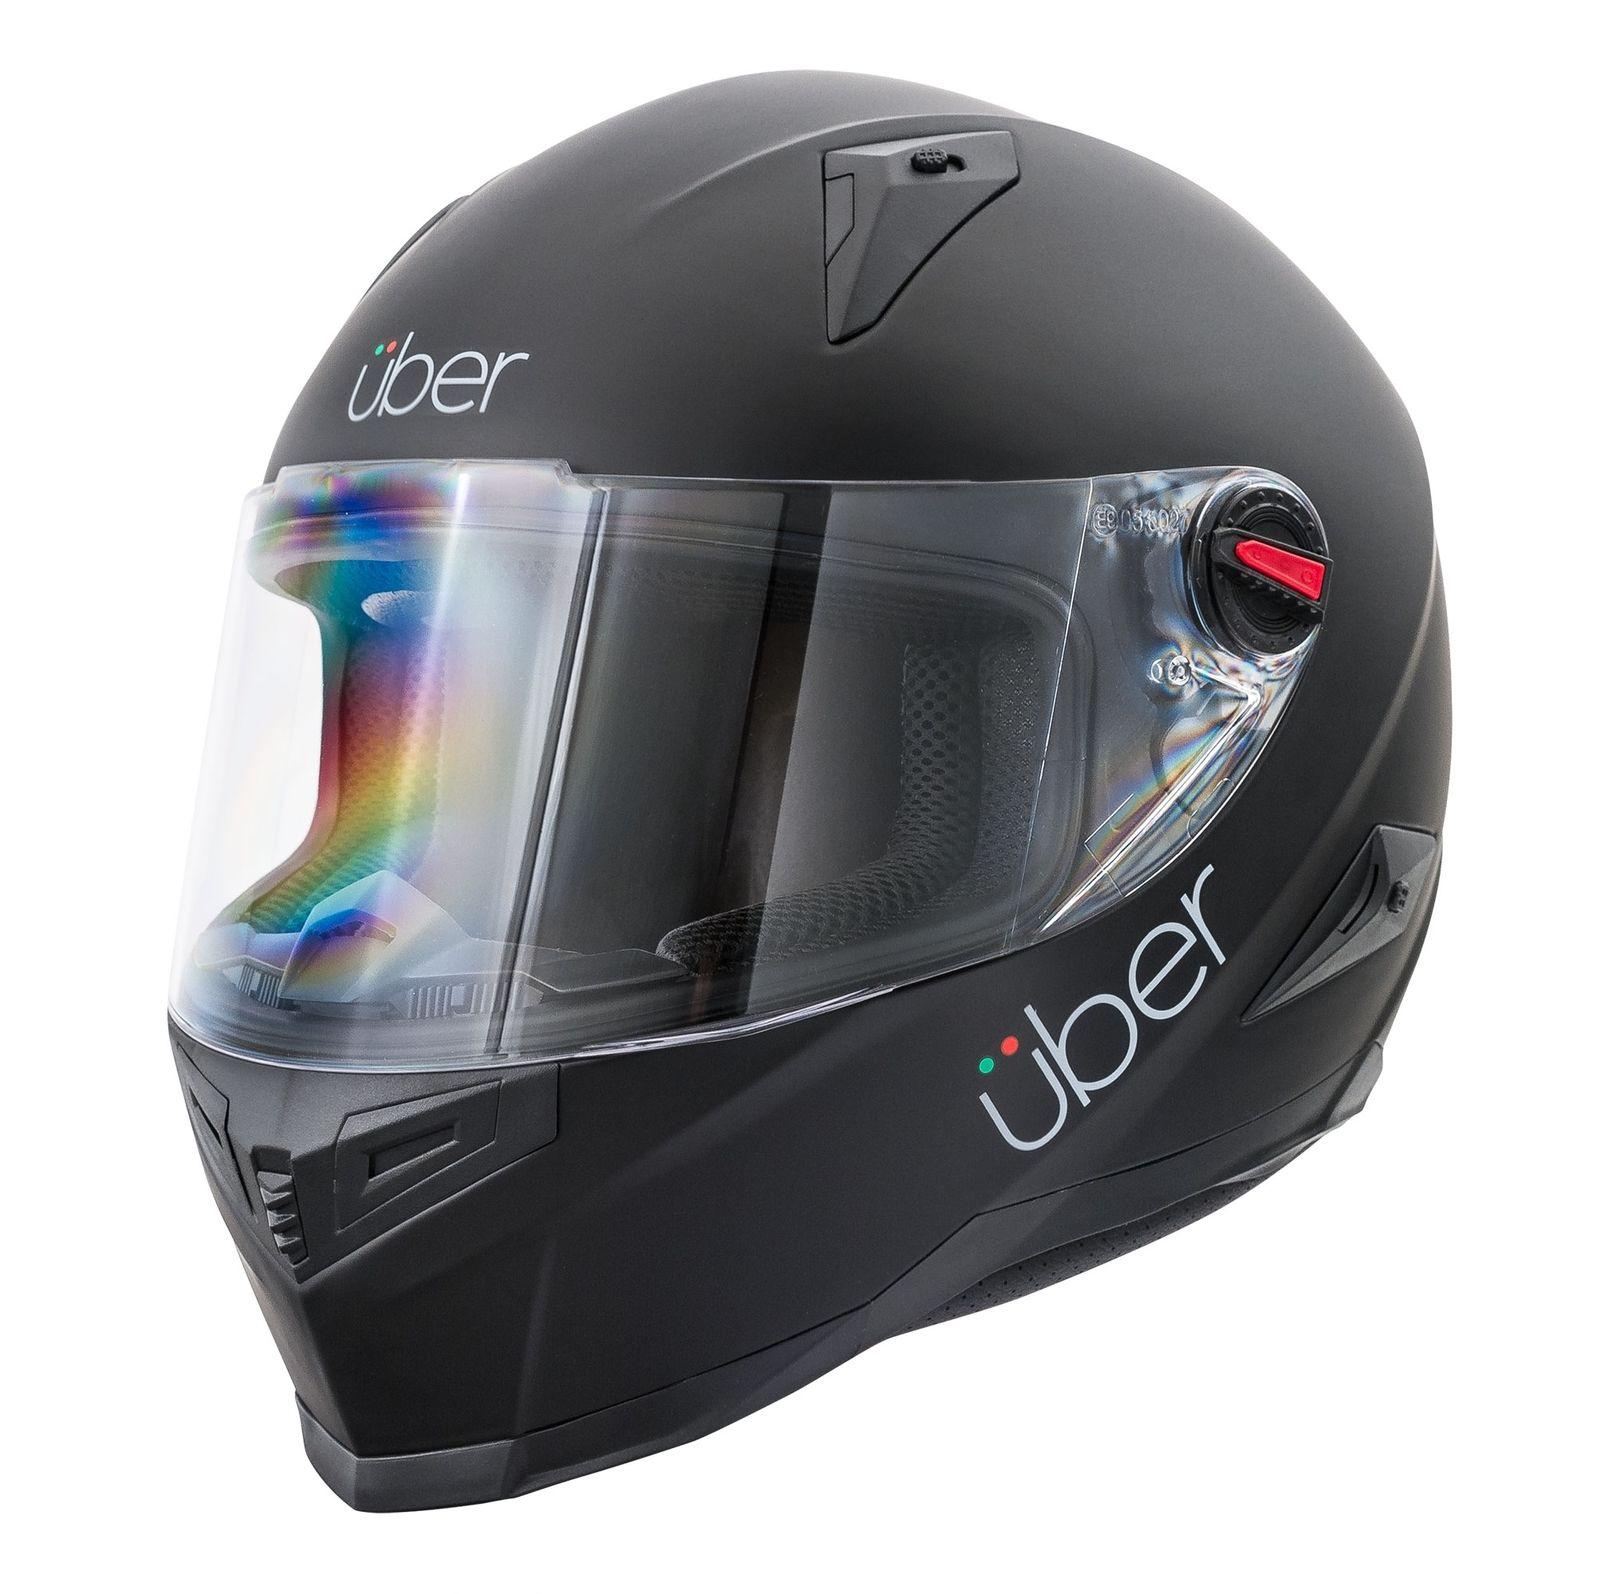 Uber Mugello ACU Gold approved Motorcycle helmet, was £74.99 now £28.21 @ demontweeksoutlet / eBay